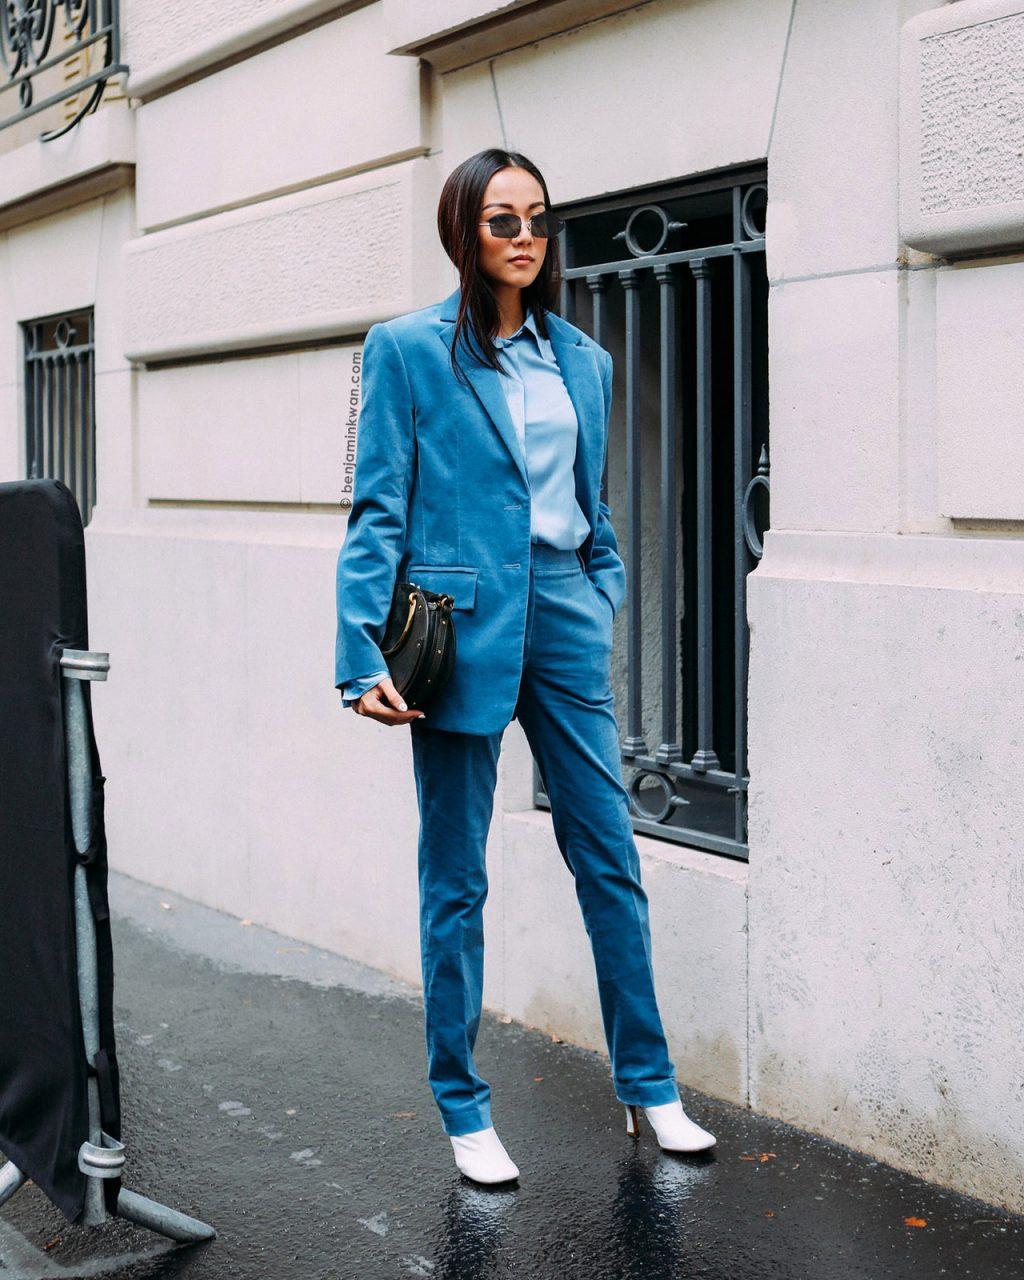 yoyo cao blazer xanh navy kính mát